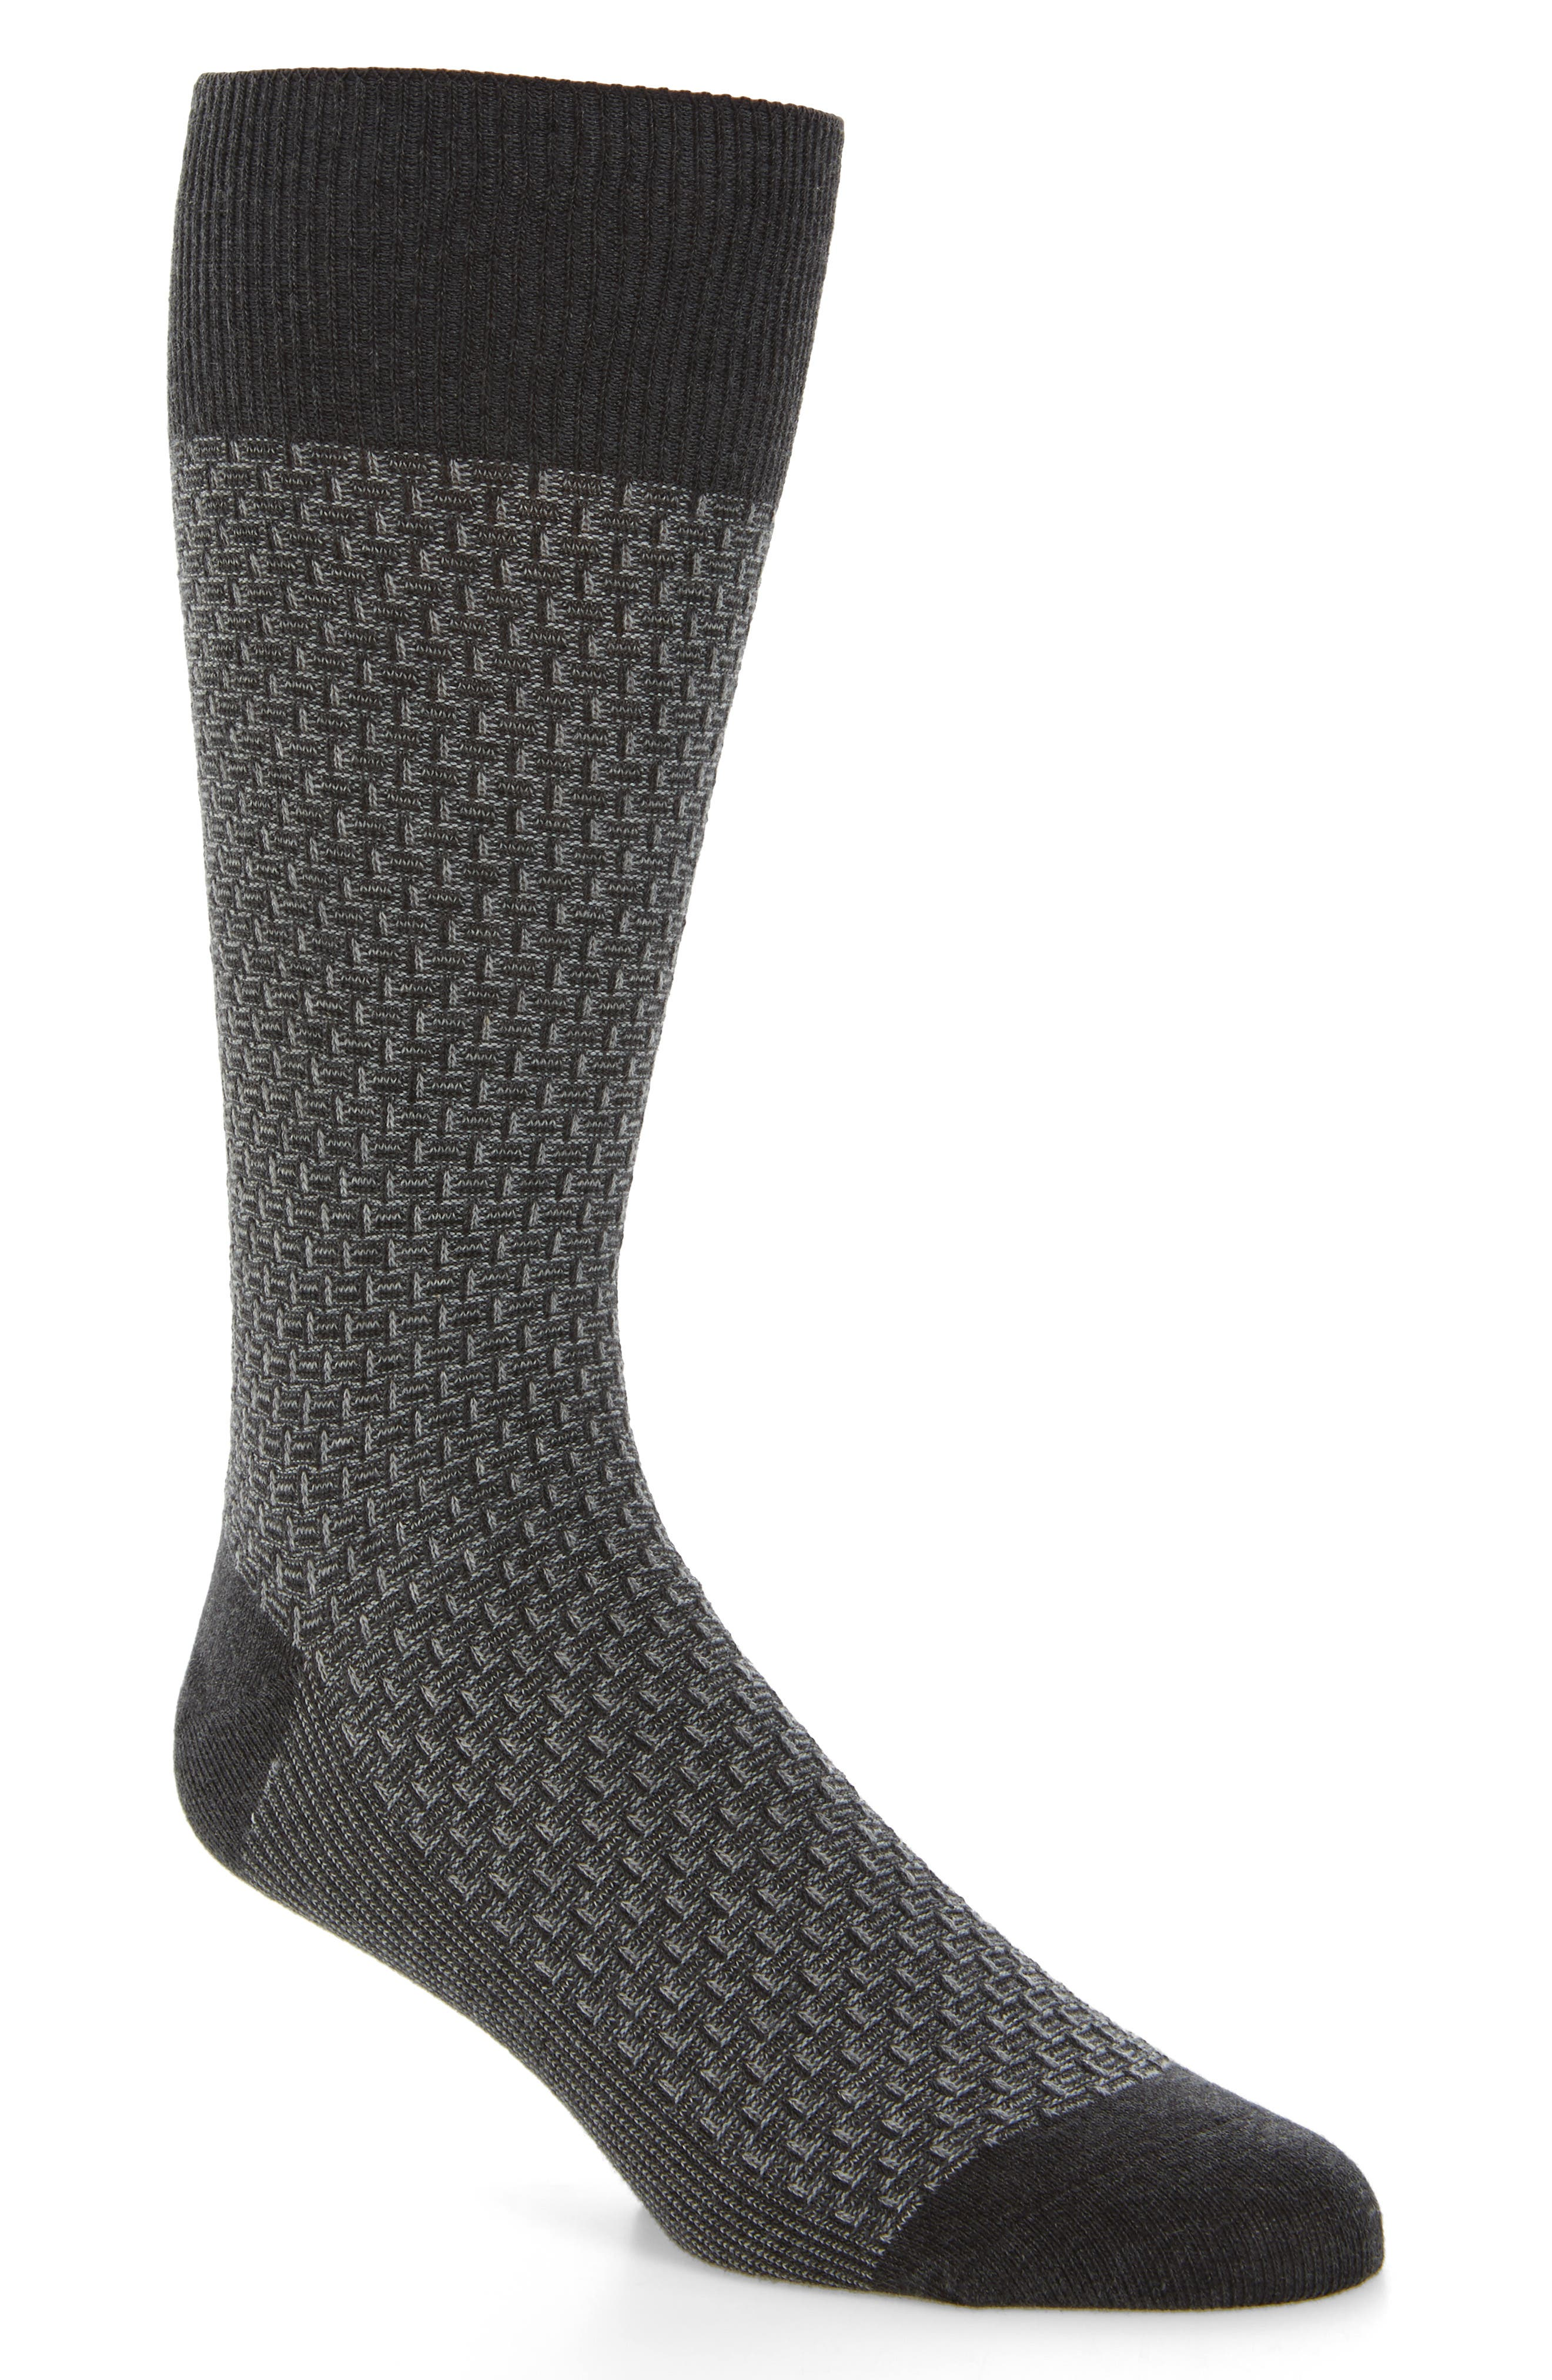 Alternate Image 1 Selected - Cole Haan Dog Bone Texture Crew Socks (3 for $30)